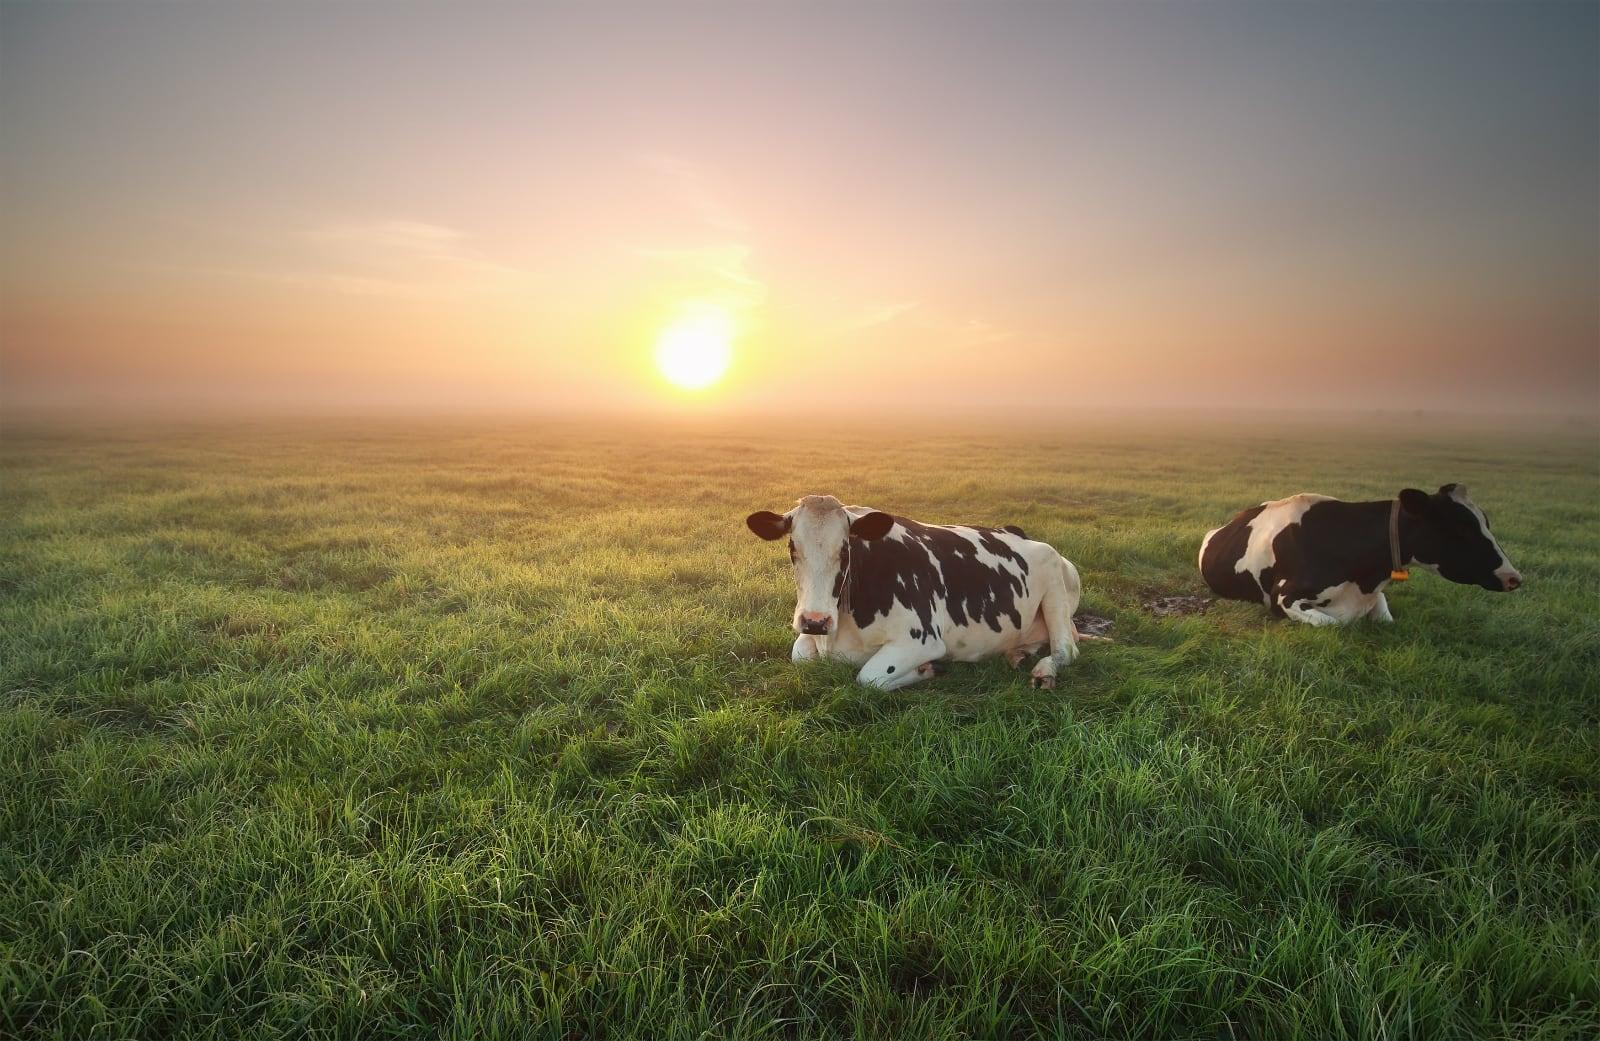 koeien liggend in weide met zonsondergang